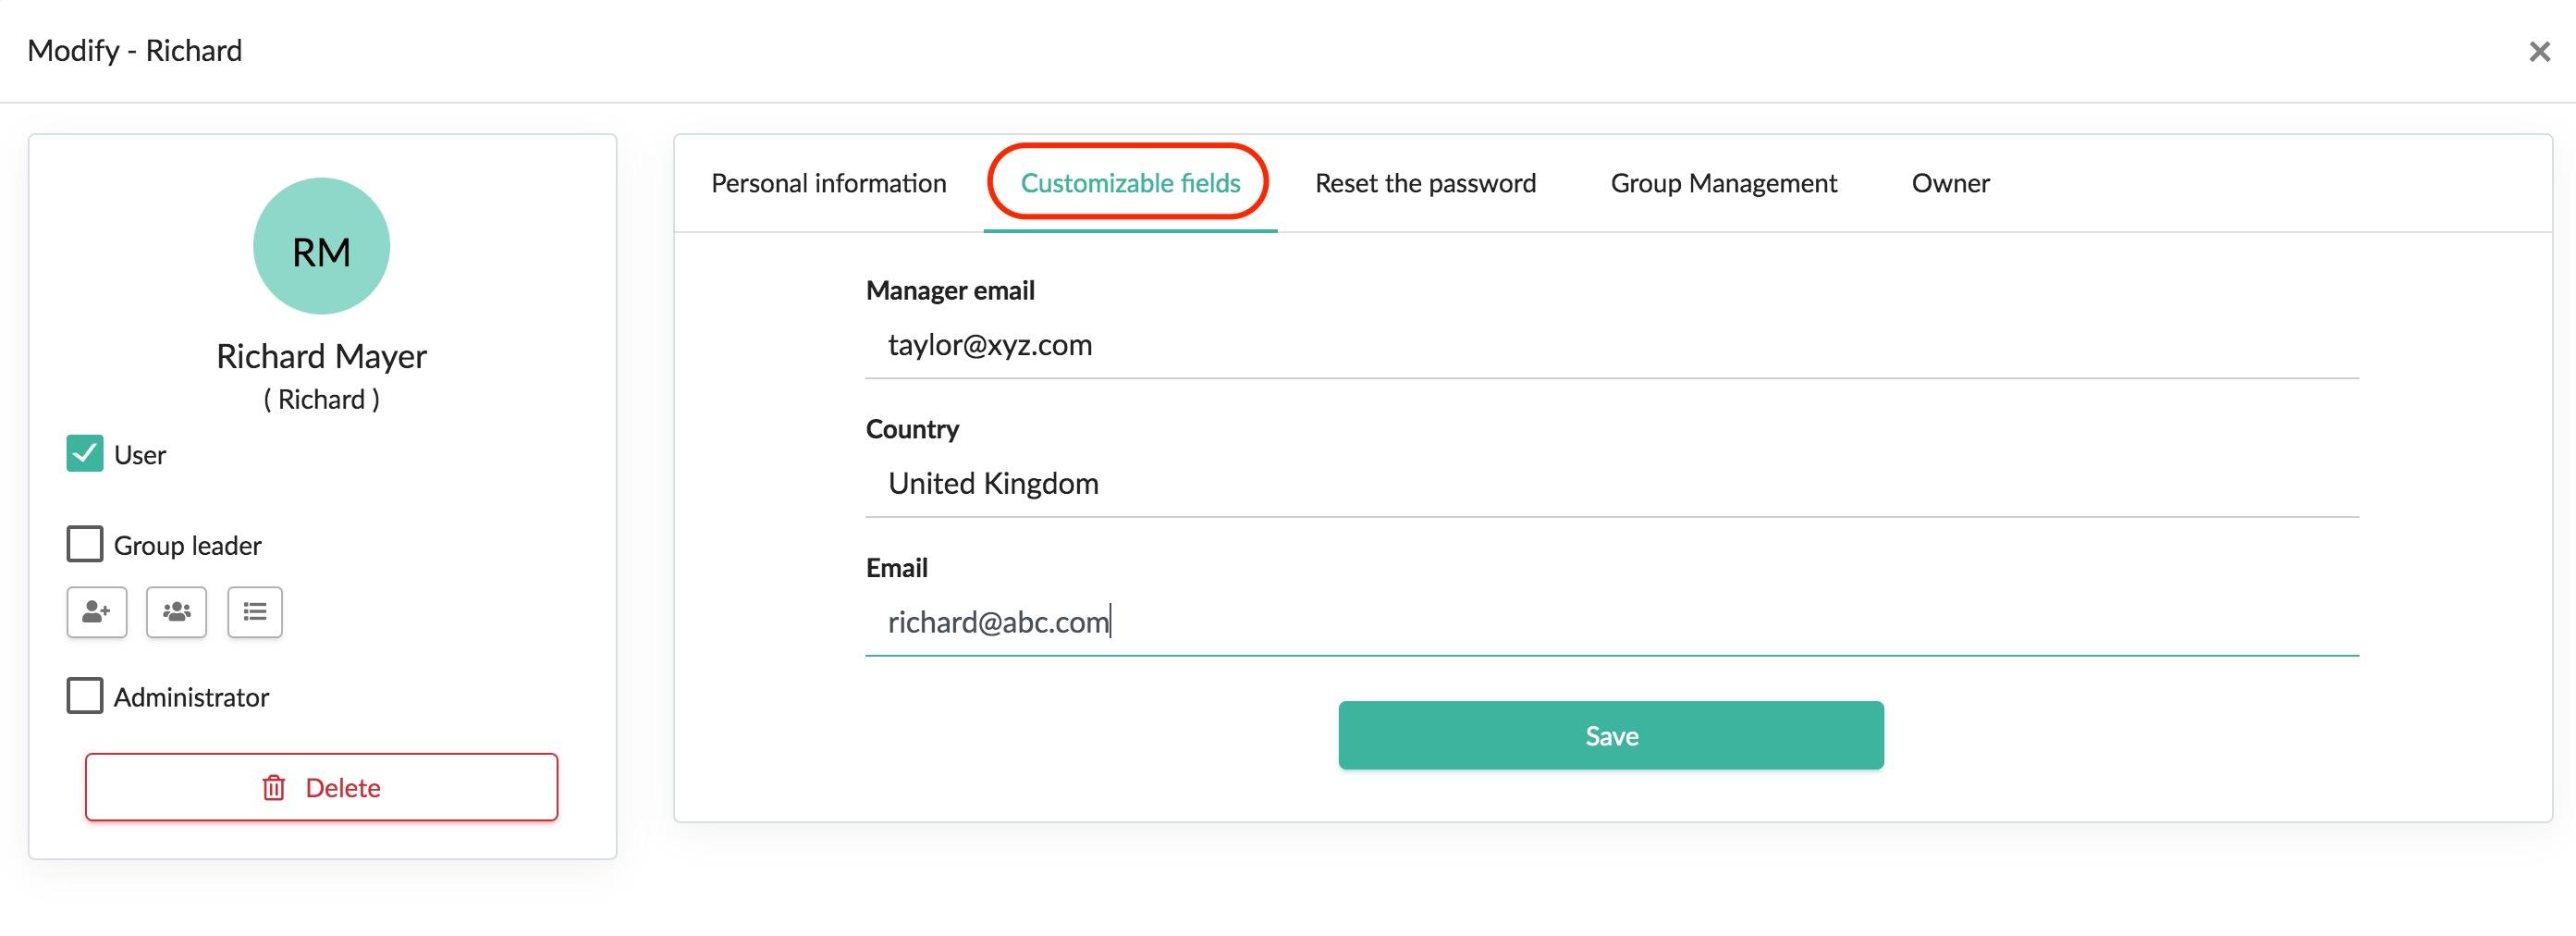 customizable fields tab